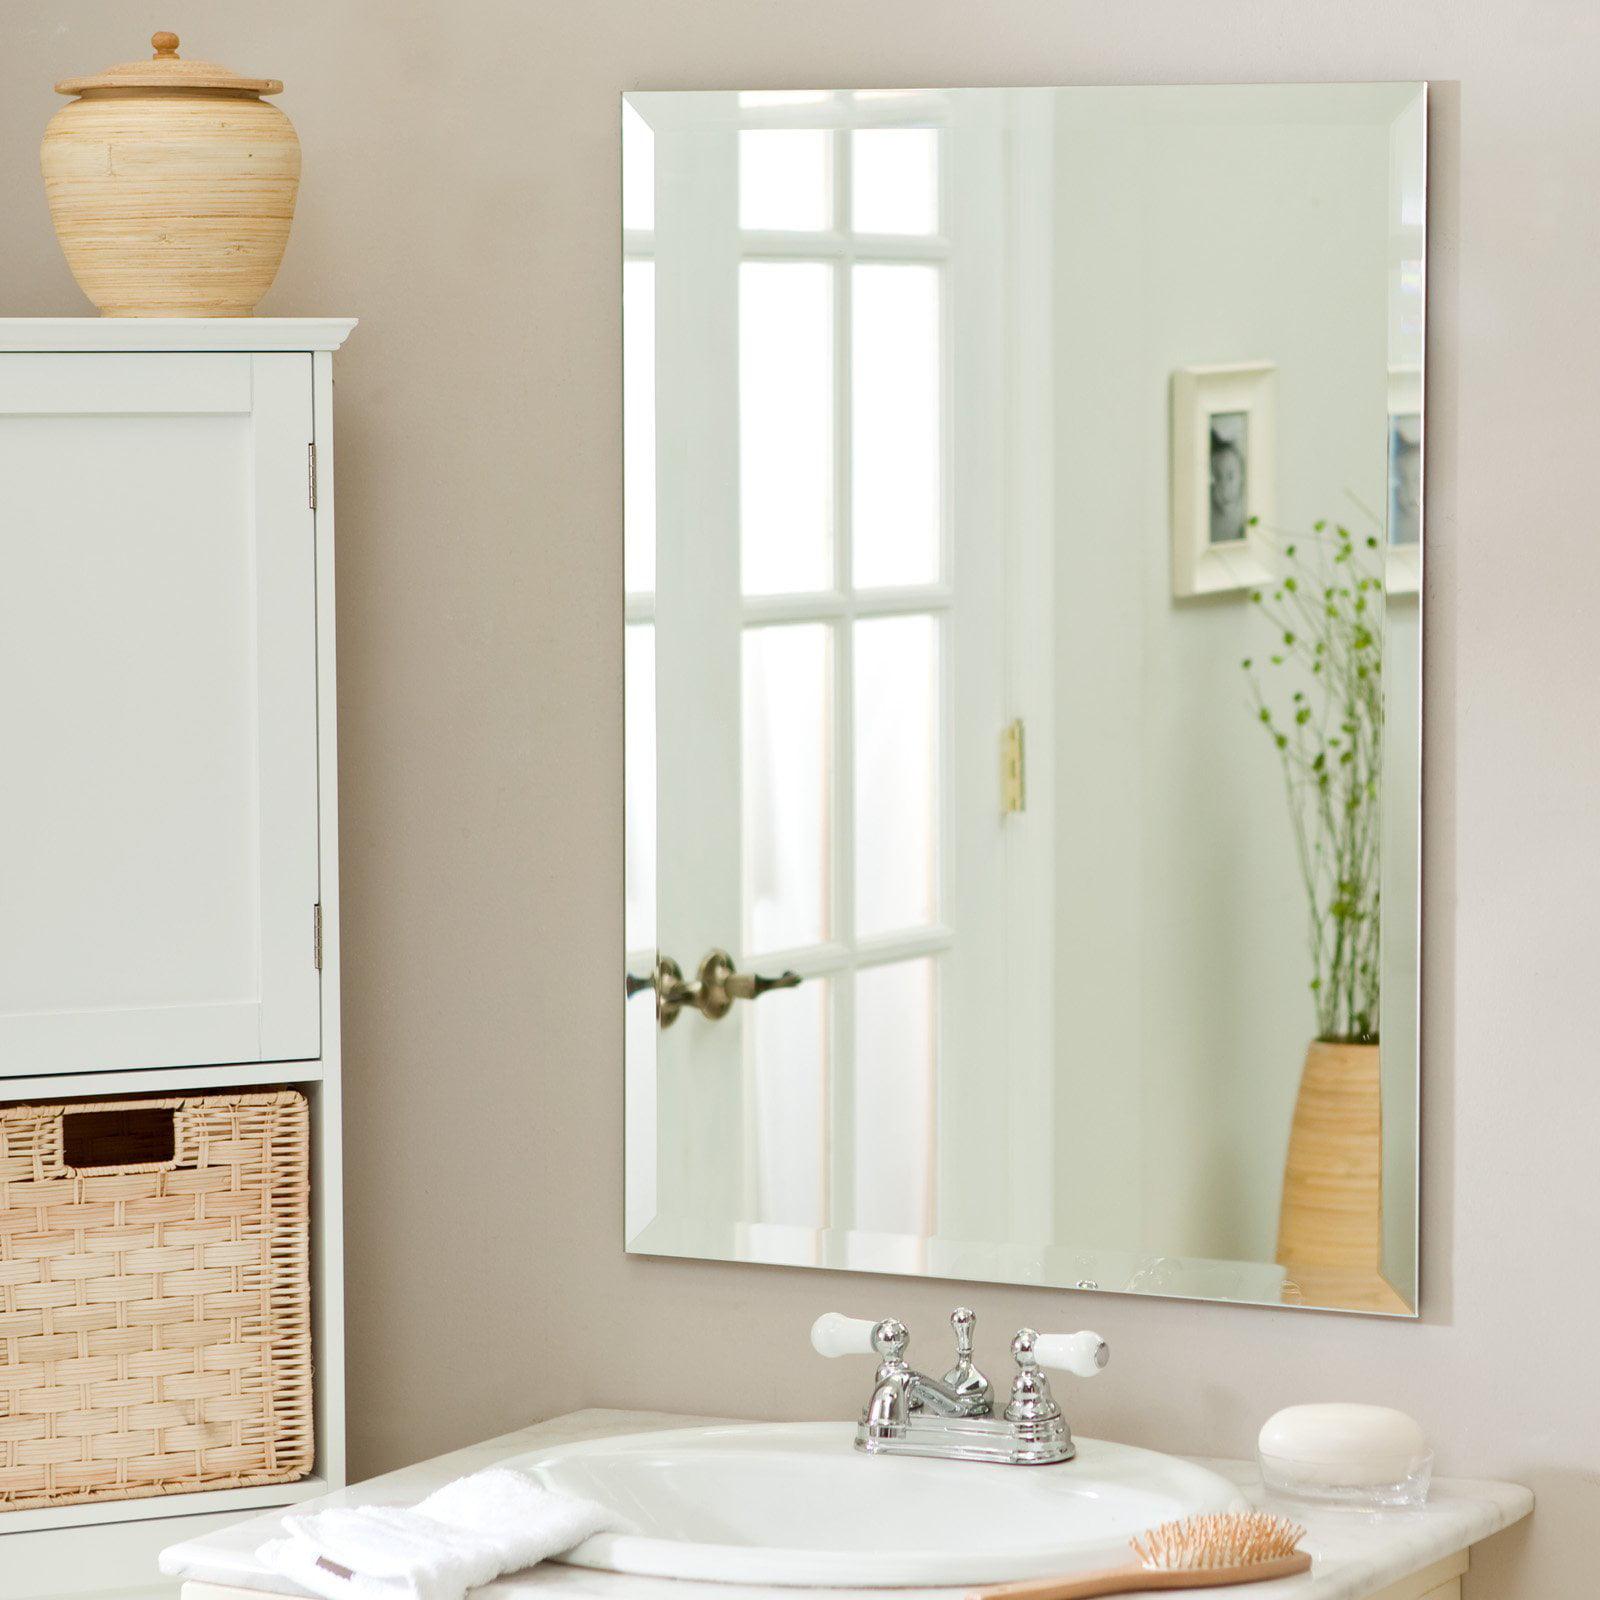 Décor Wonderland Frameless Leona Wall Mirror - 23.5W x 31.5H in. -  Walmart.com